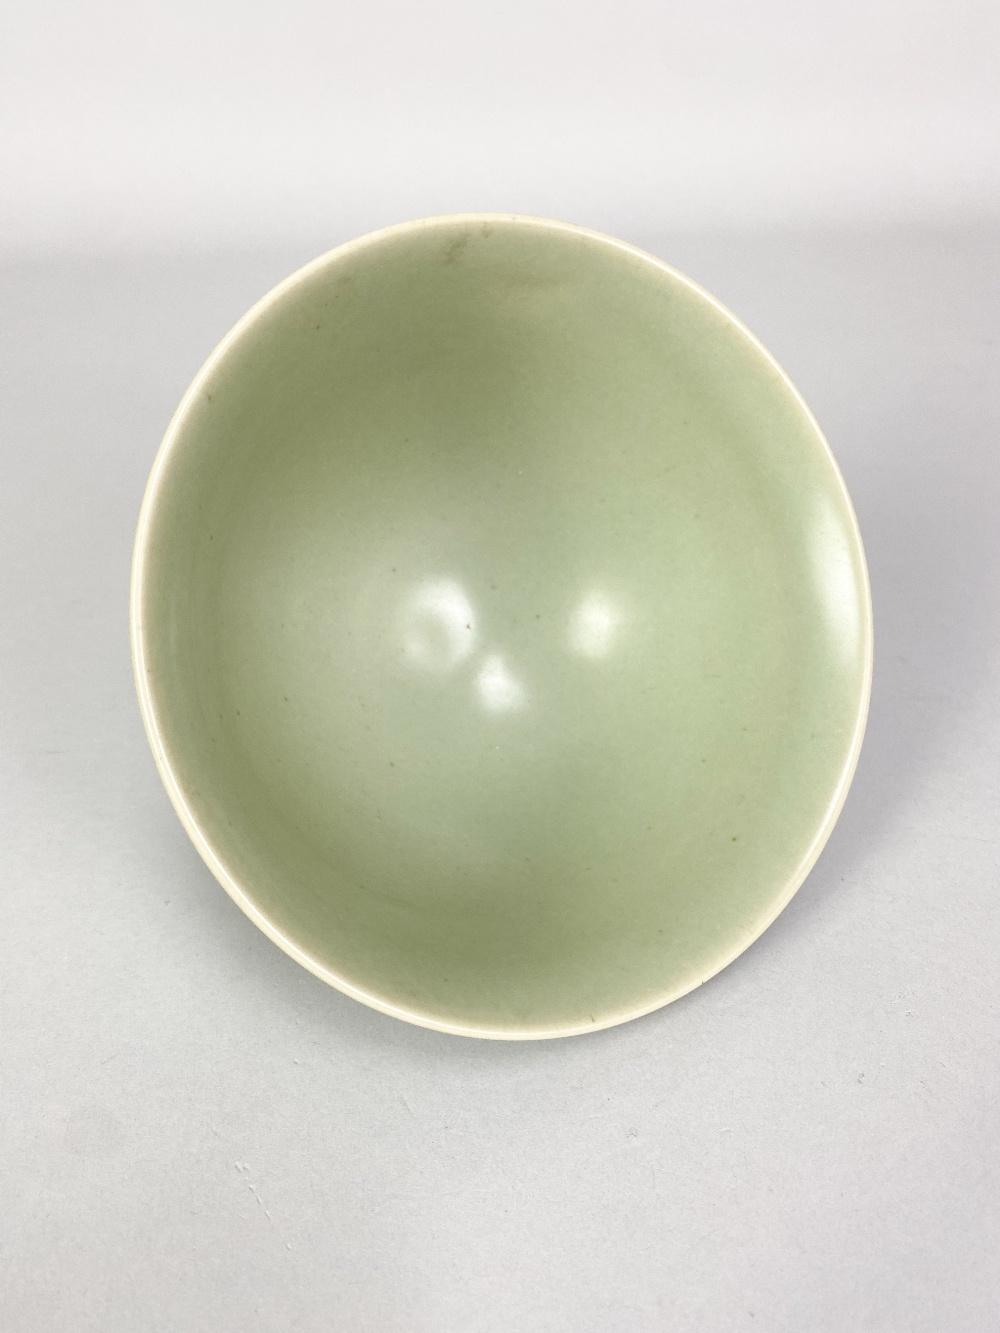 AGNETE HOY (1914-2000) for BullersStudio; a porcelain footed bowl covered in celadon glaze, - Image 3 of 5